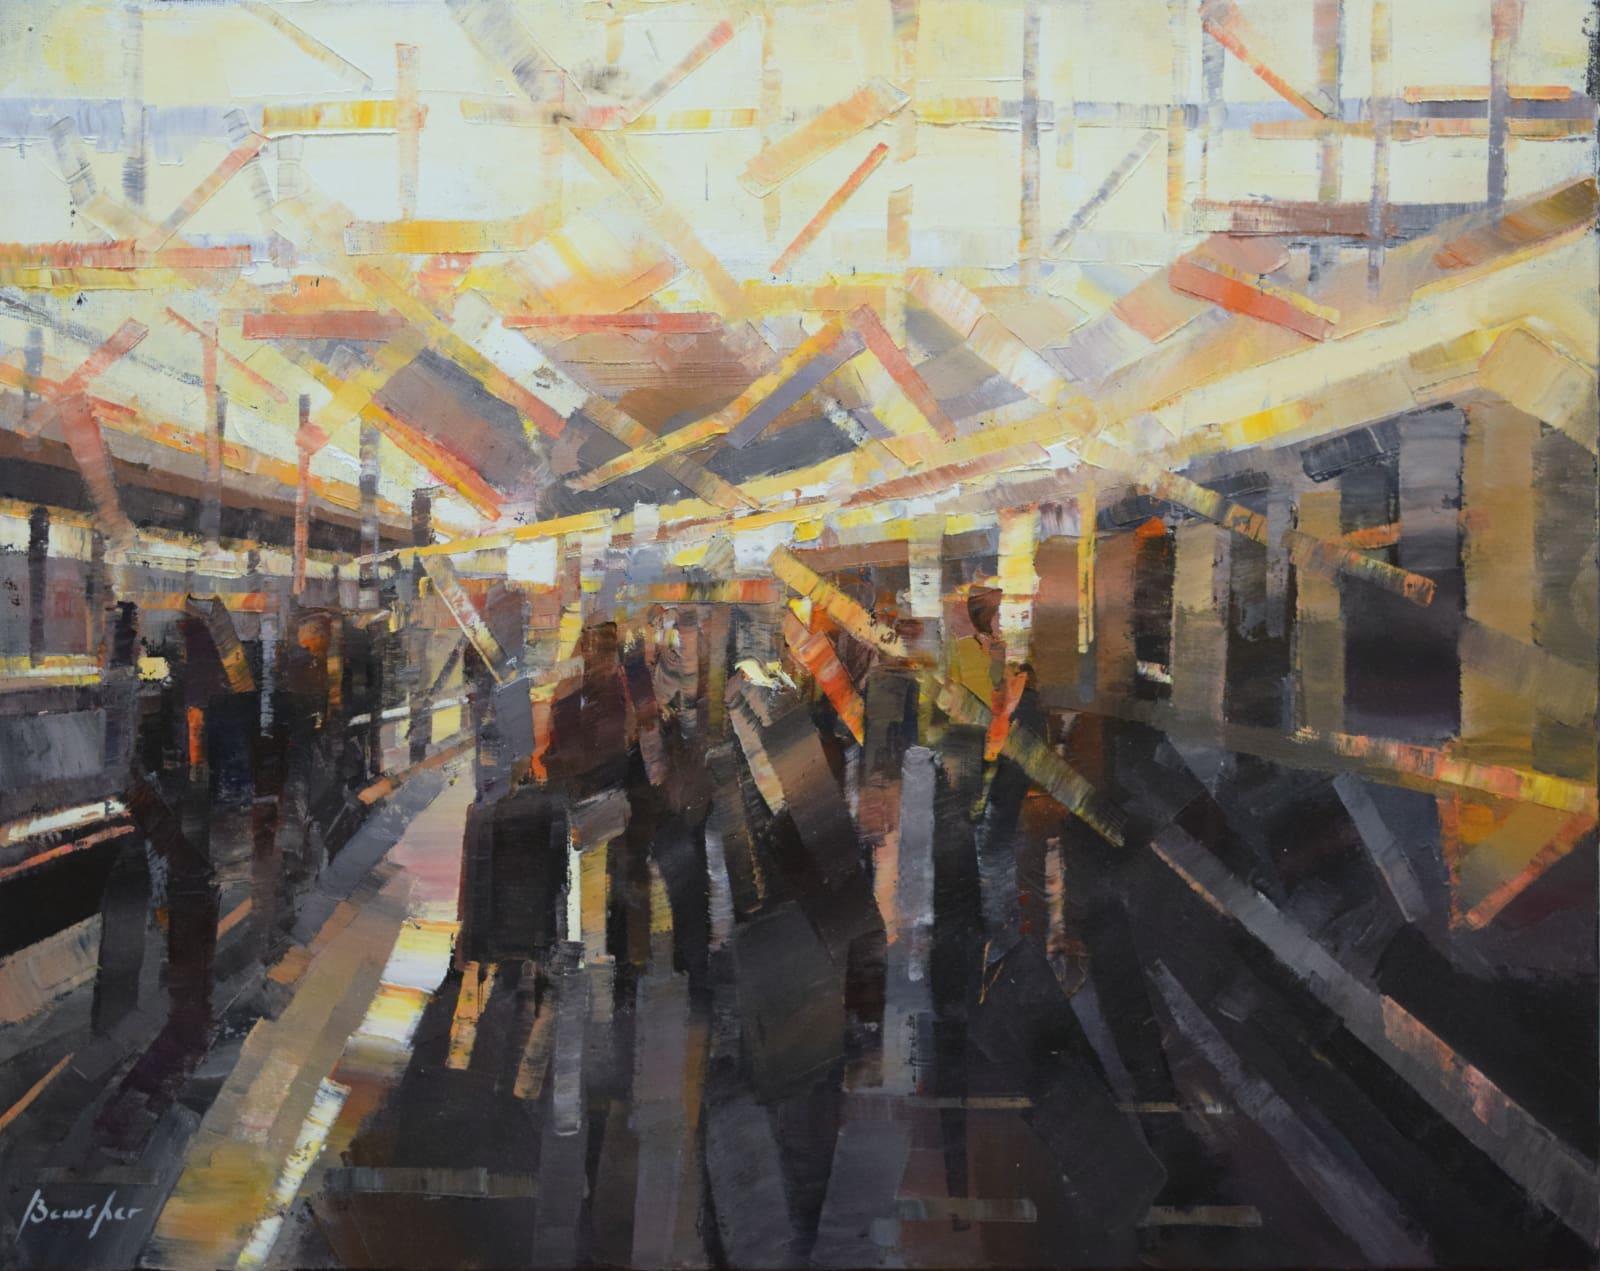 Steve Bewsher, Passengers Boarding a Train, 2018